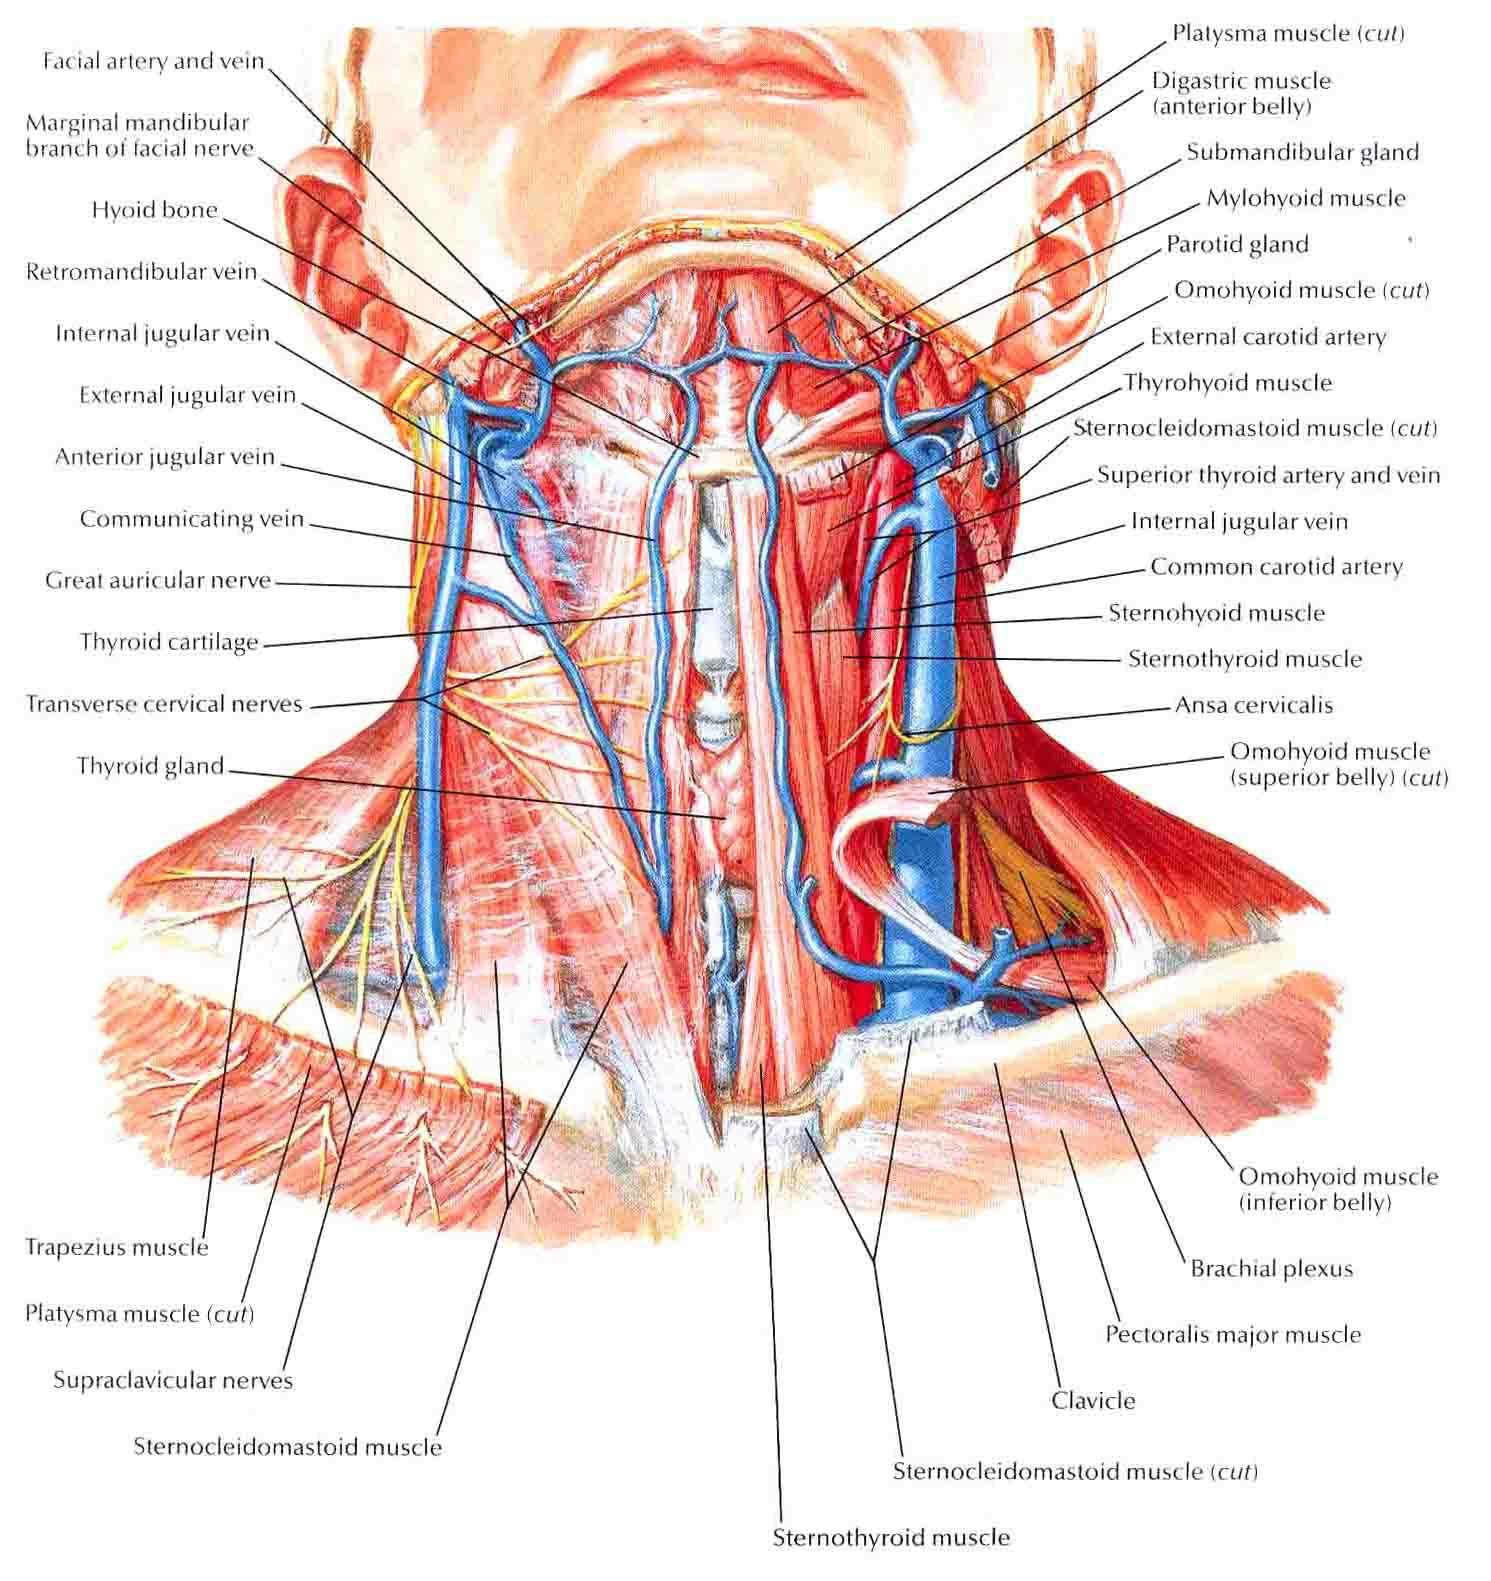 human neck muscles diagram human anatomy drawing pinterest rh pinterest com human body nerve system diagram nerves of the human arm [ 1491 x 1581 Pixel ]